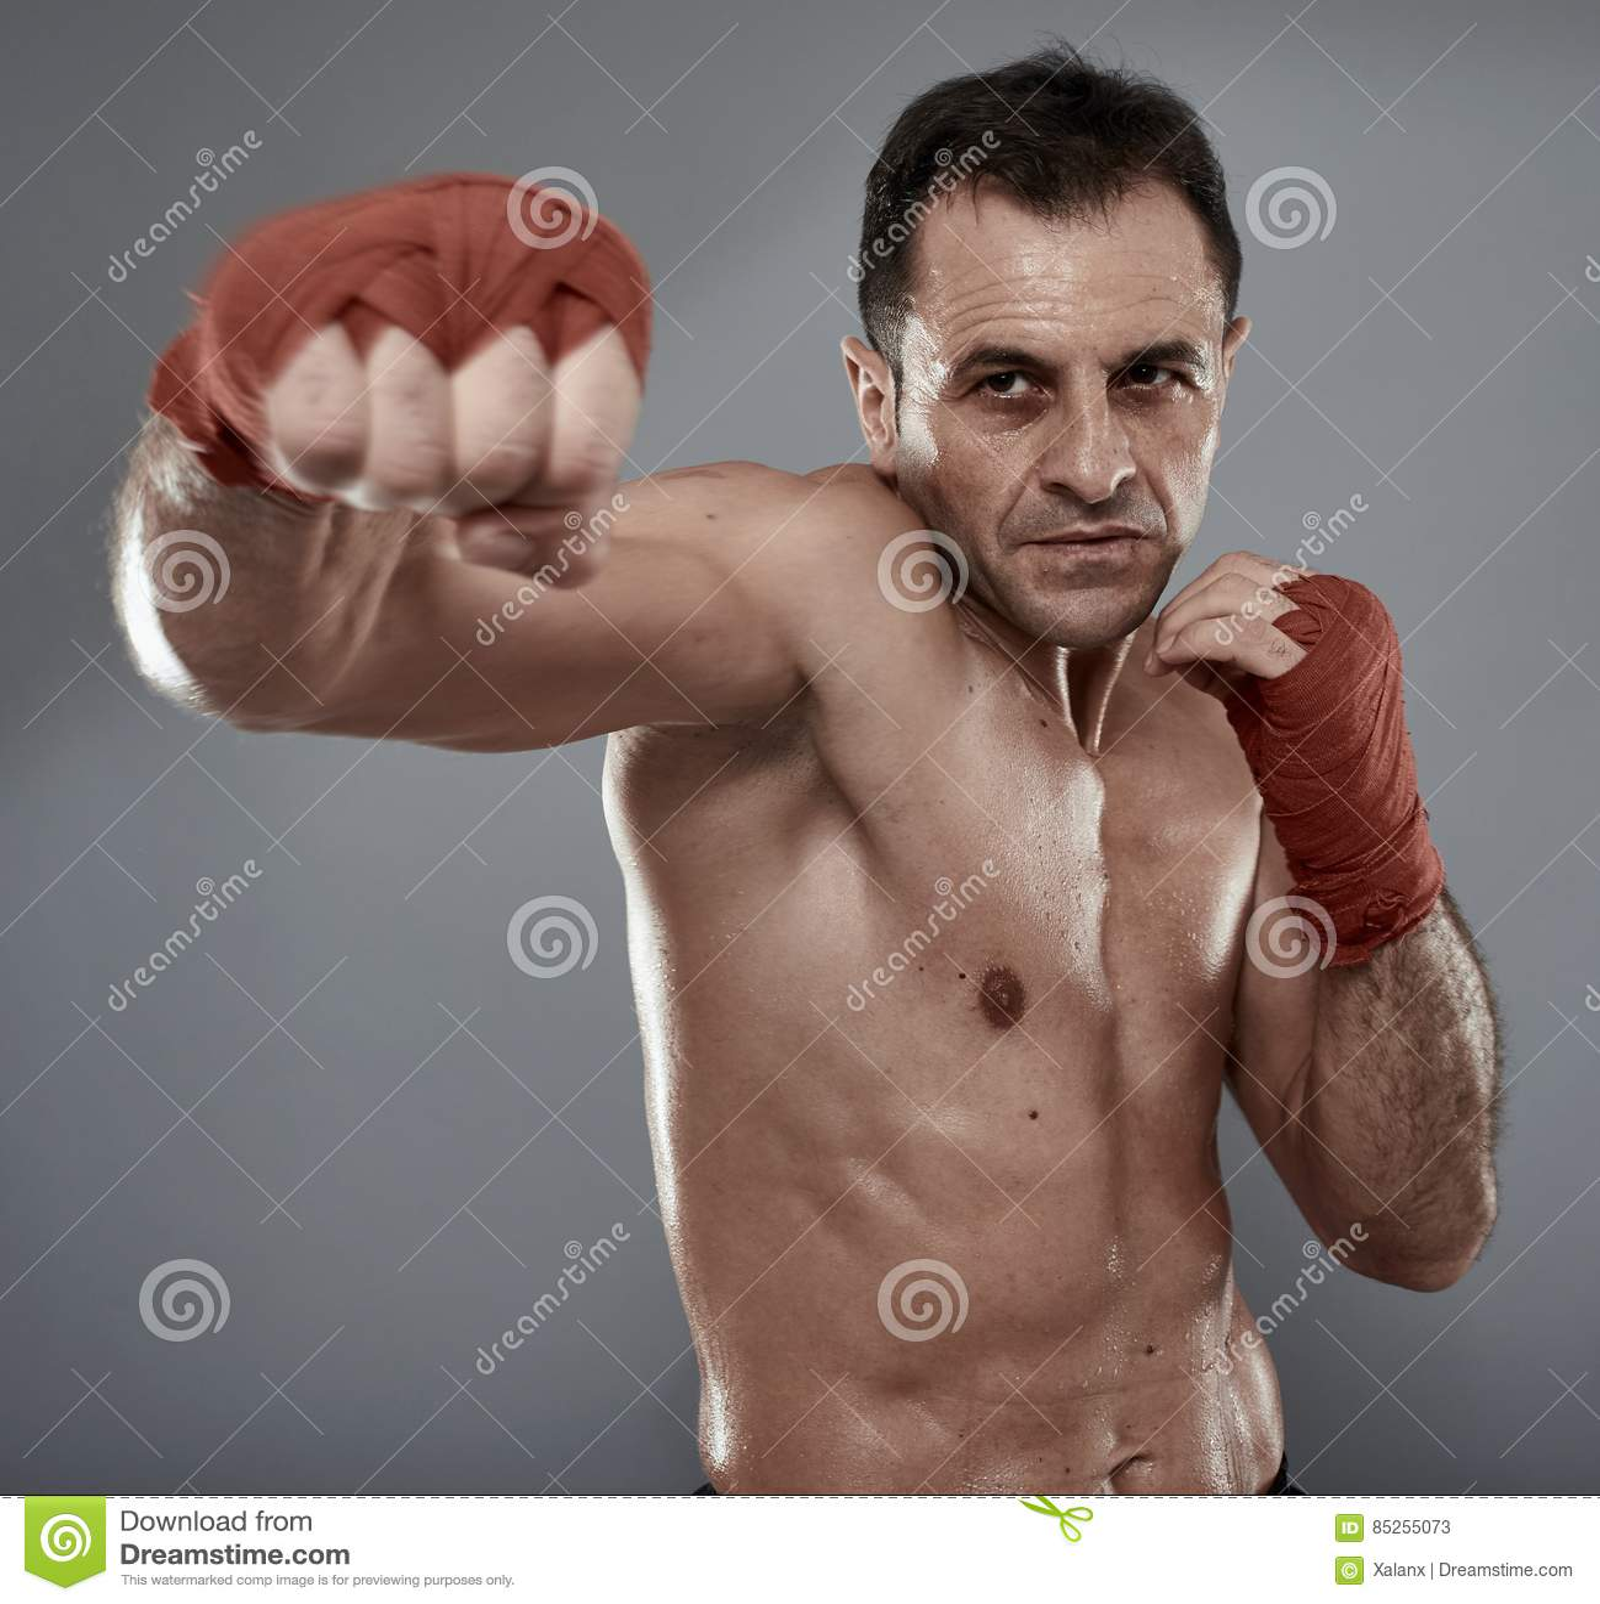 Kickbox fighter on gray background